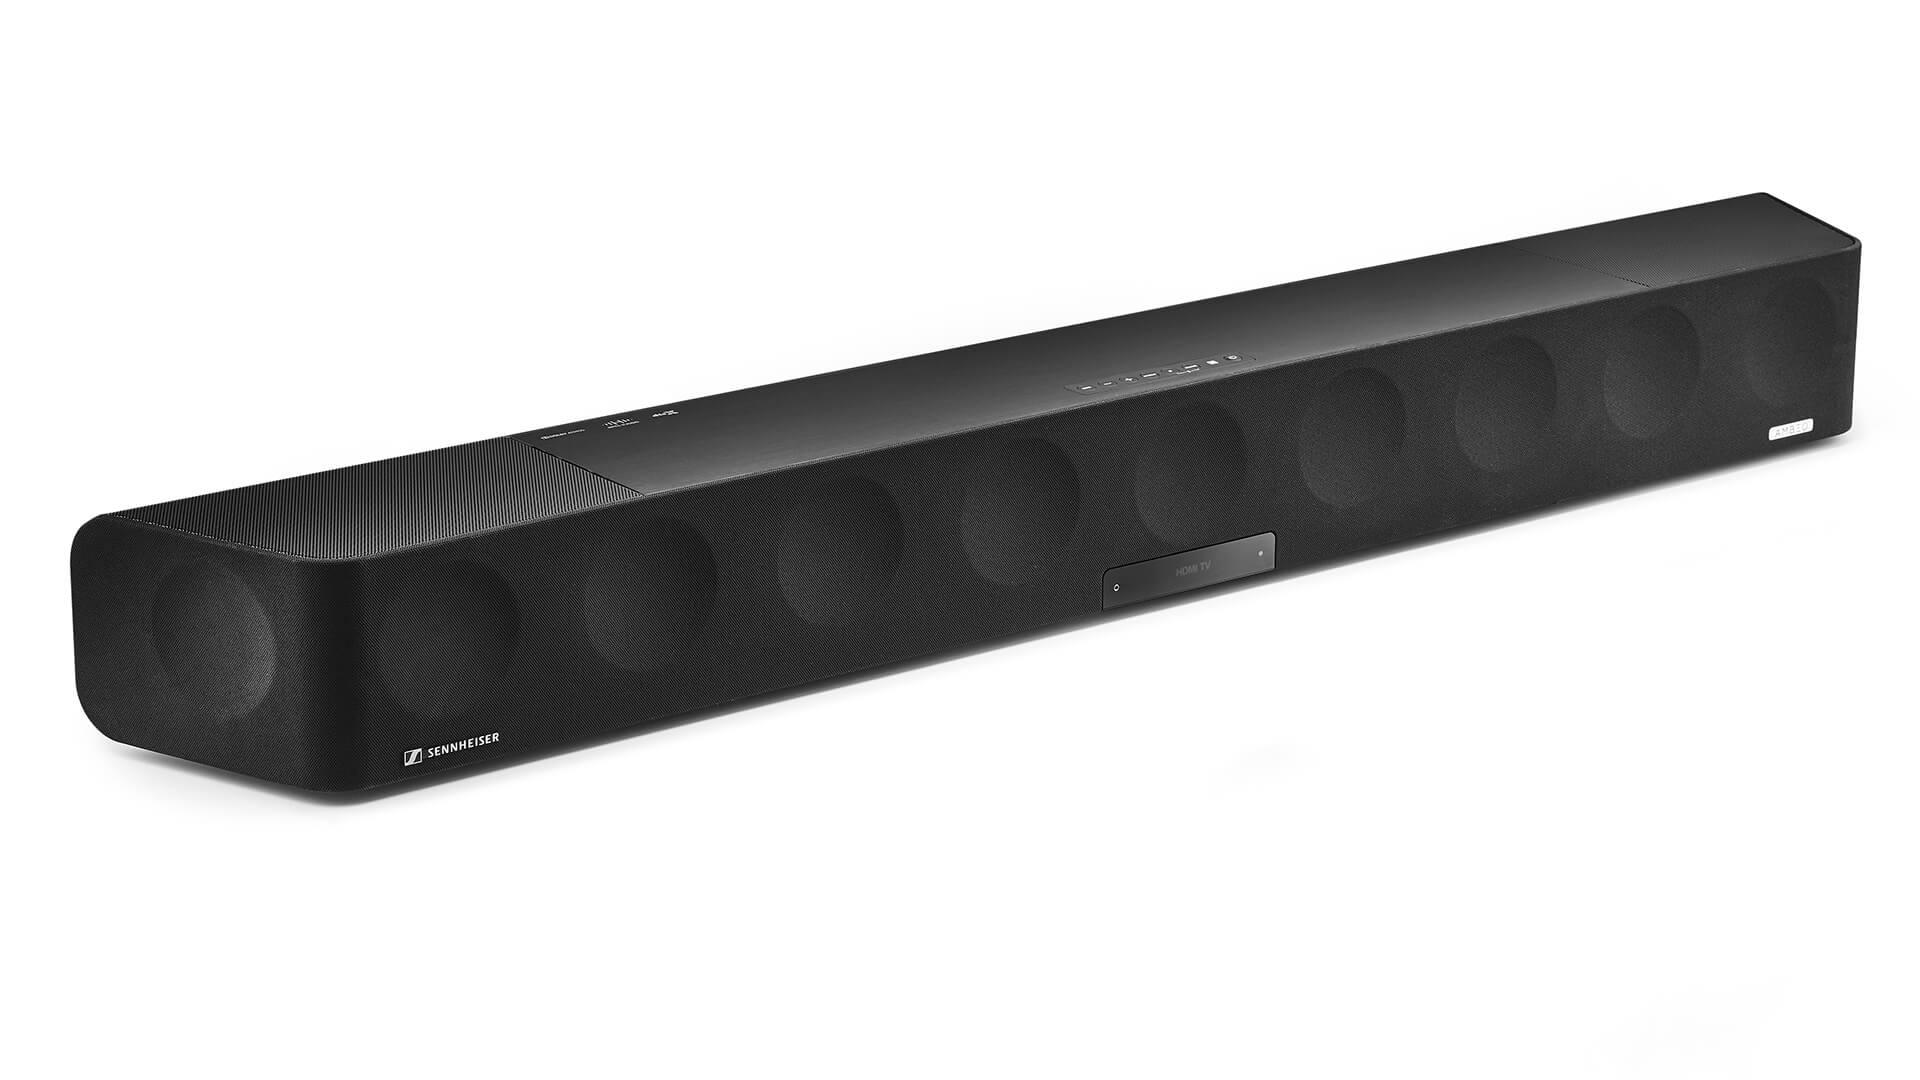 Ljudlimpa bäst i test premium - Sennheiser Ambeo Soundbar SB01